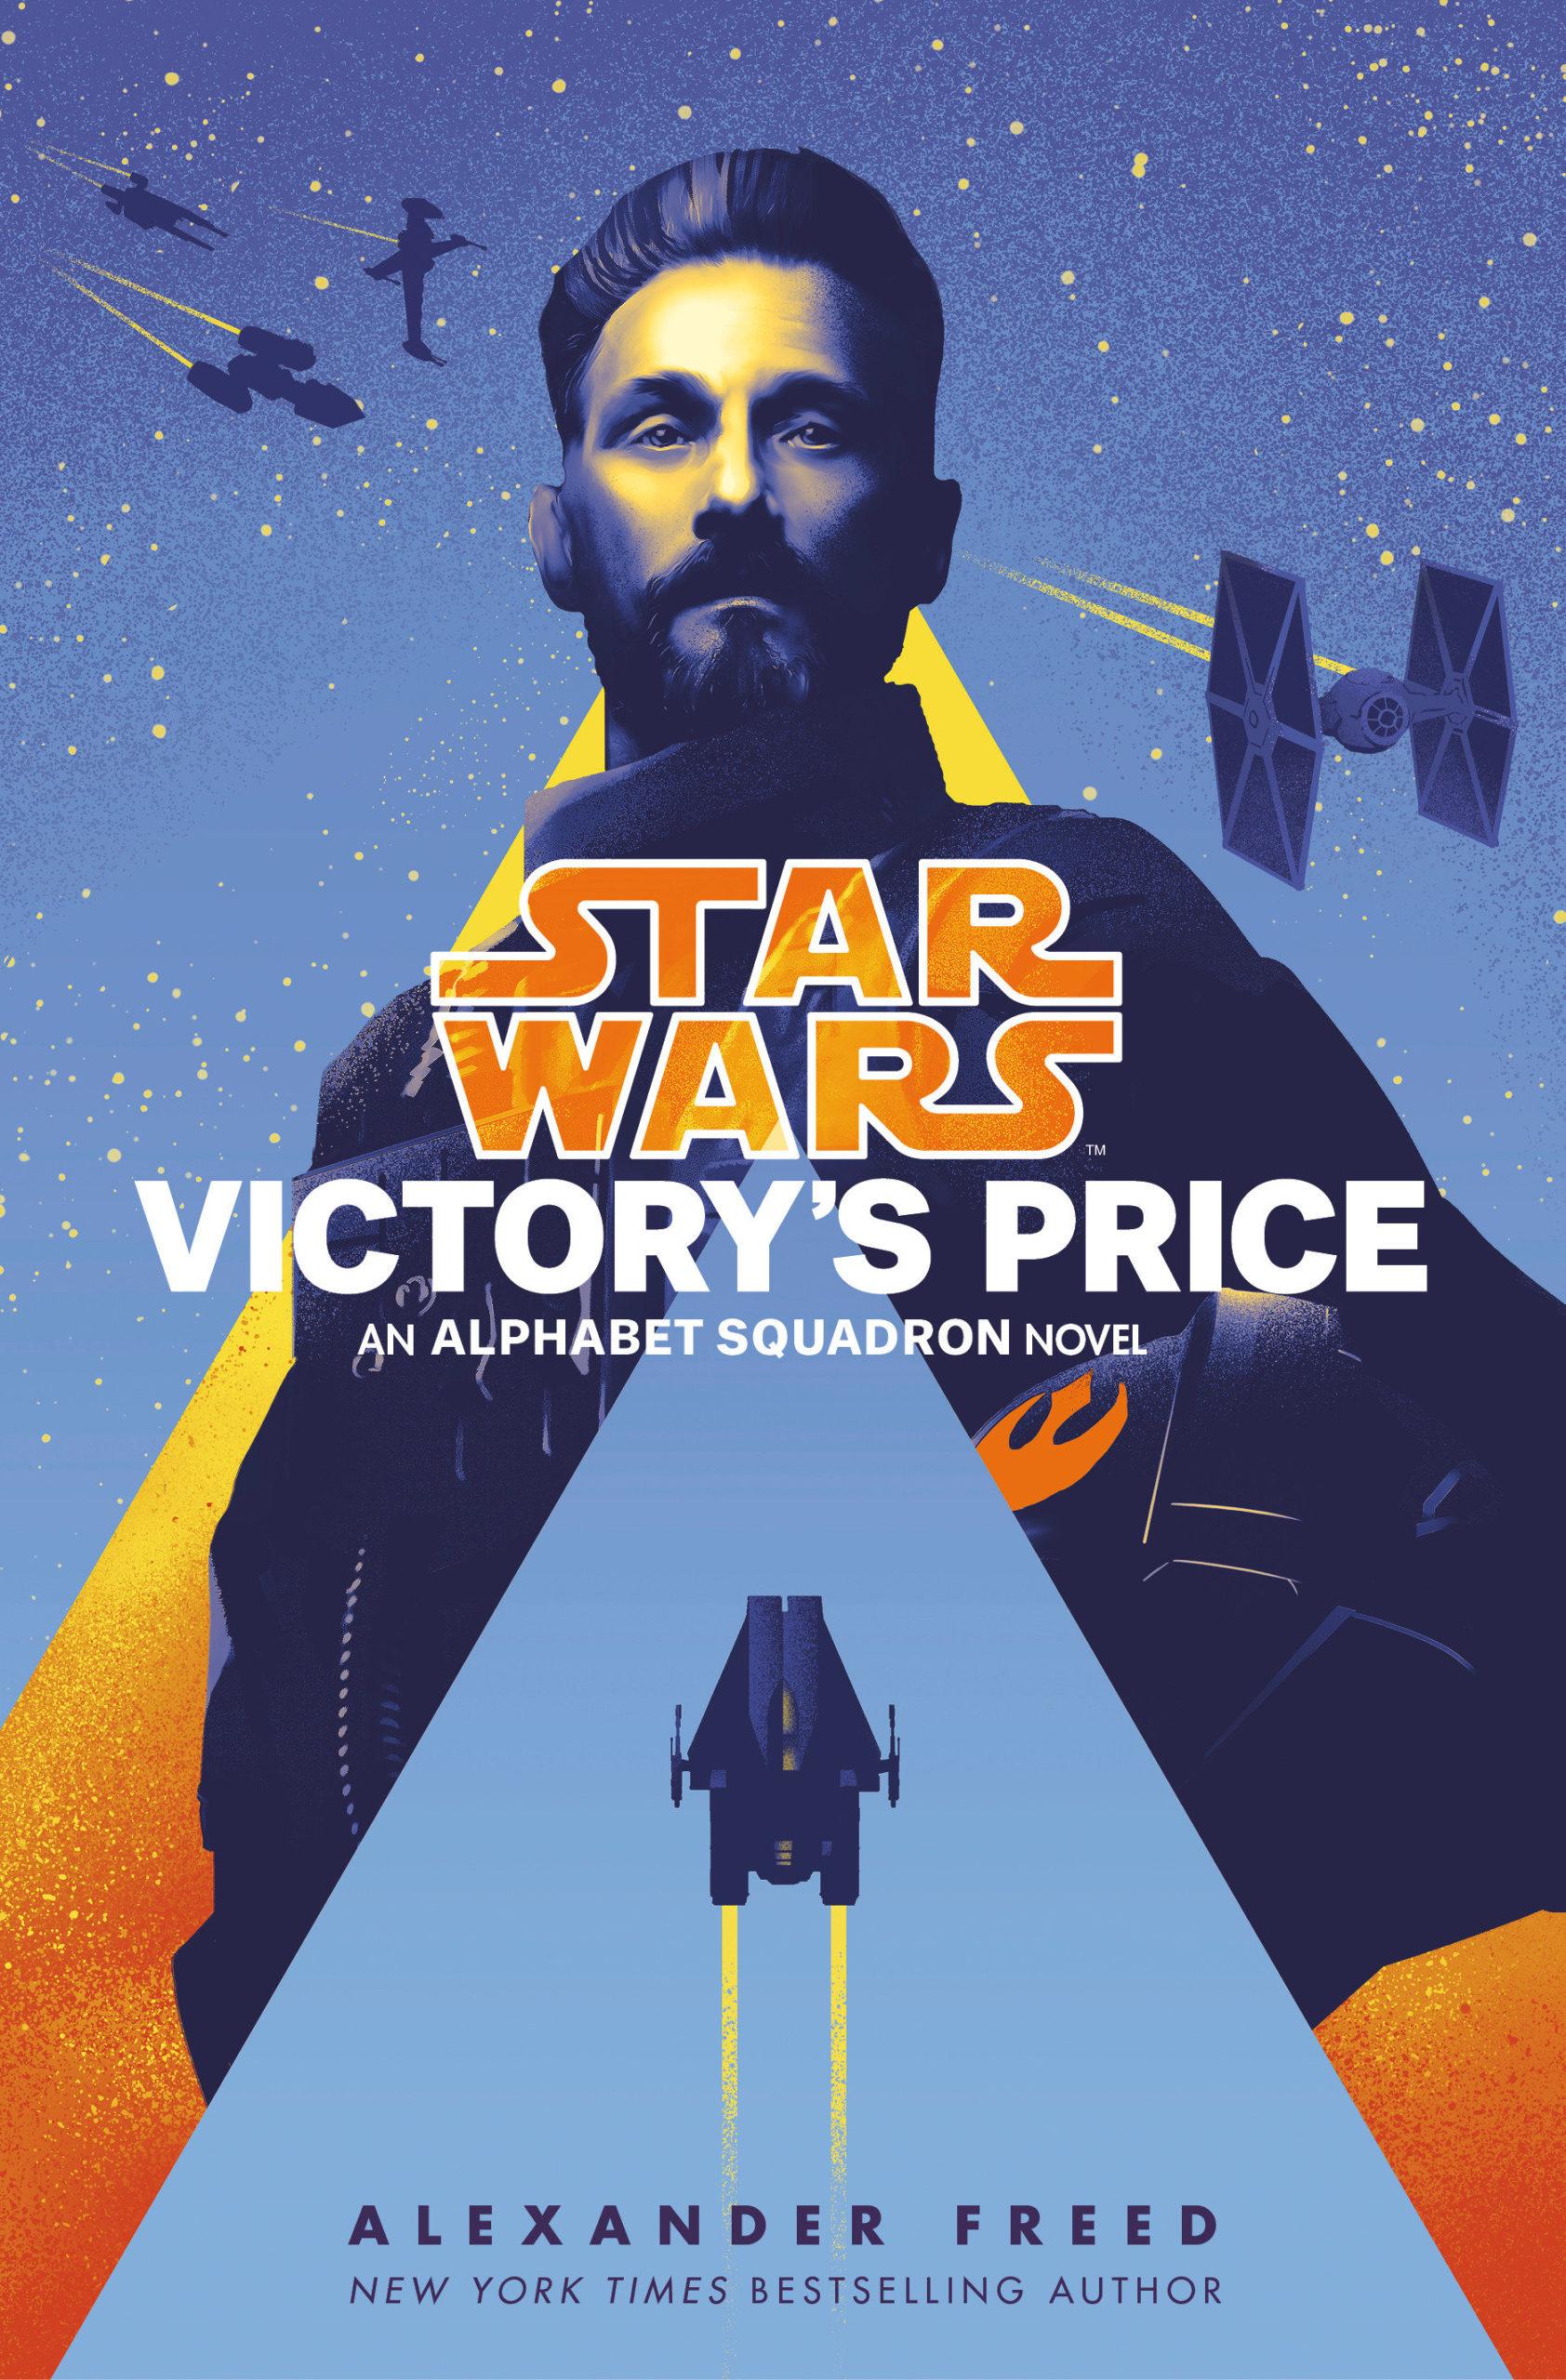 Victory's Price: An Alphabet Squadron Novel (02.03.2021)